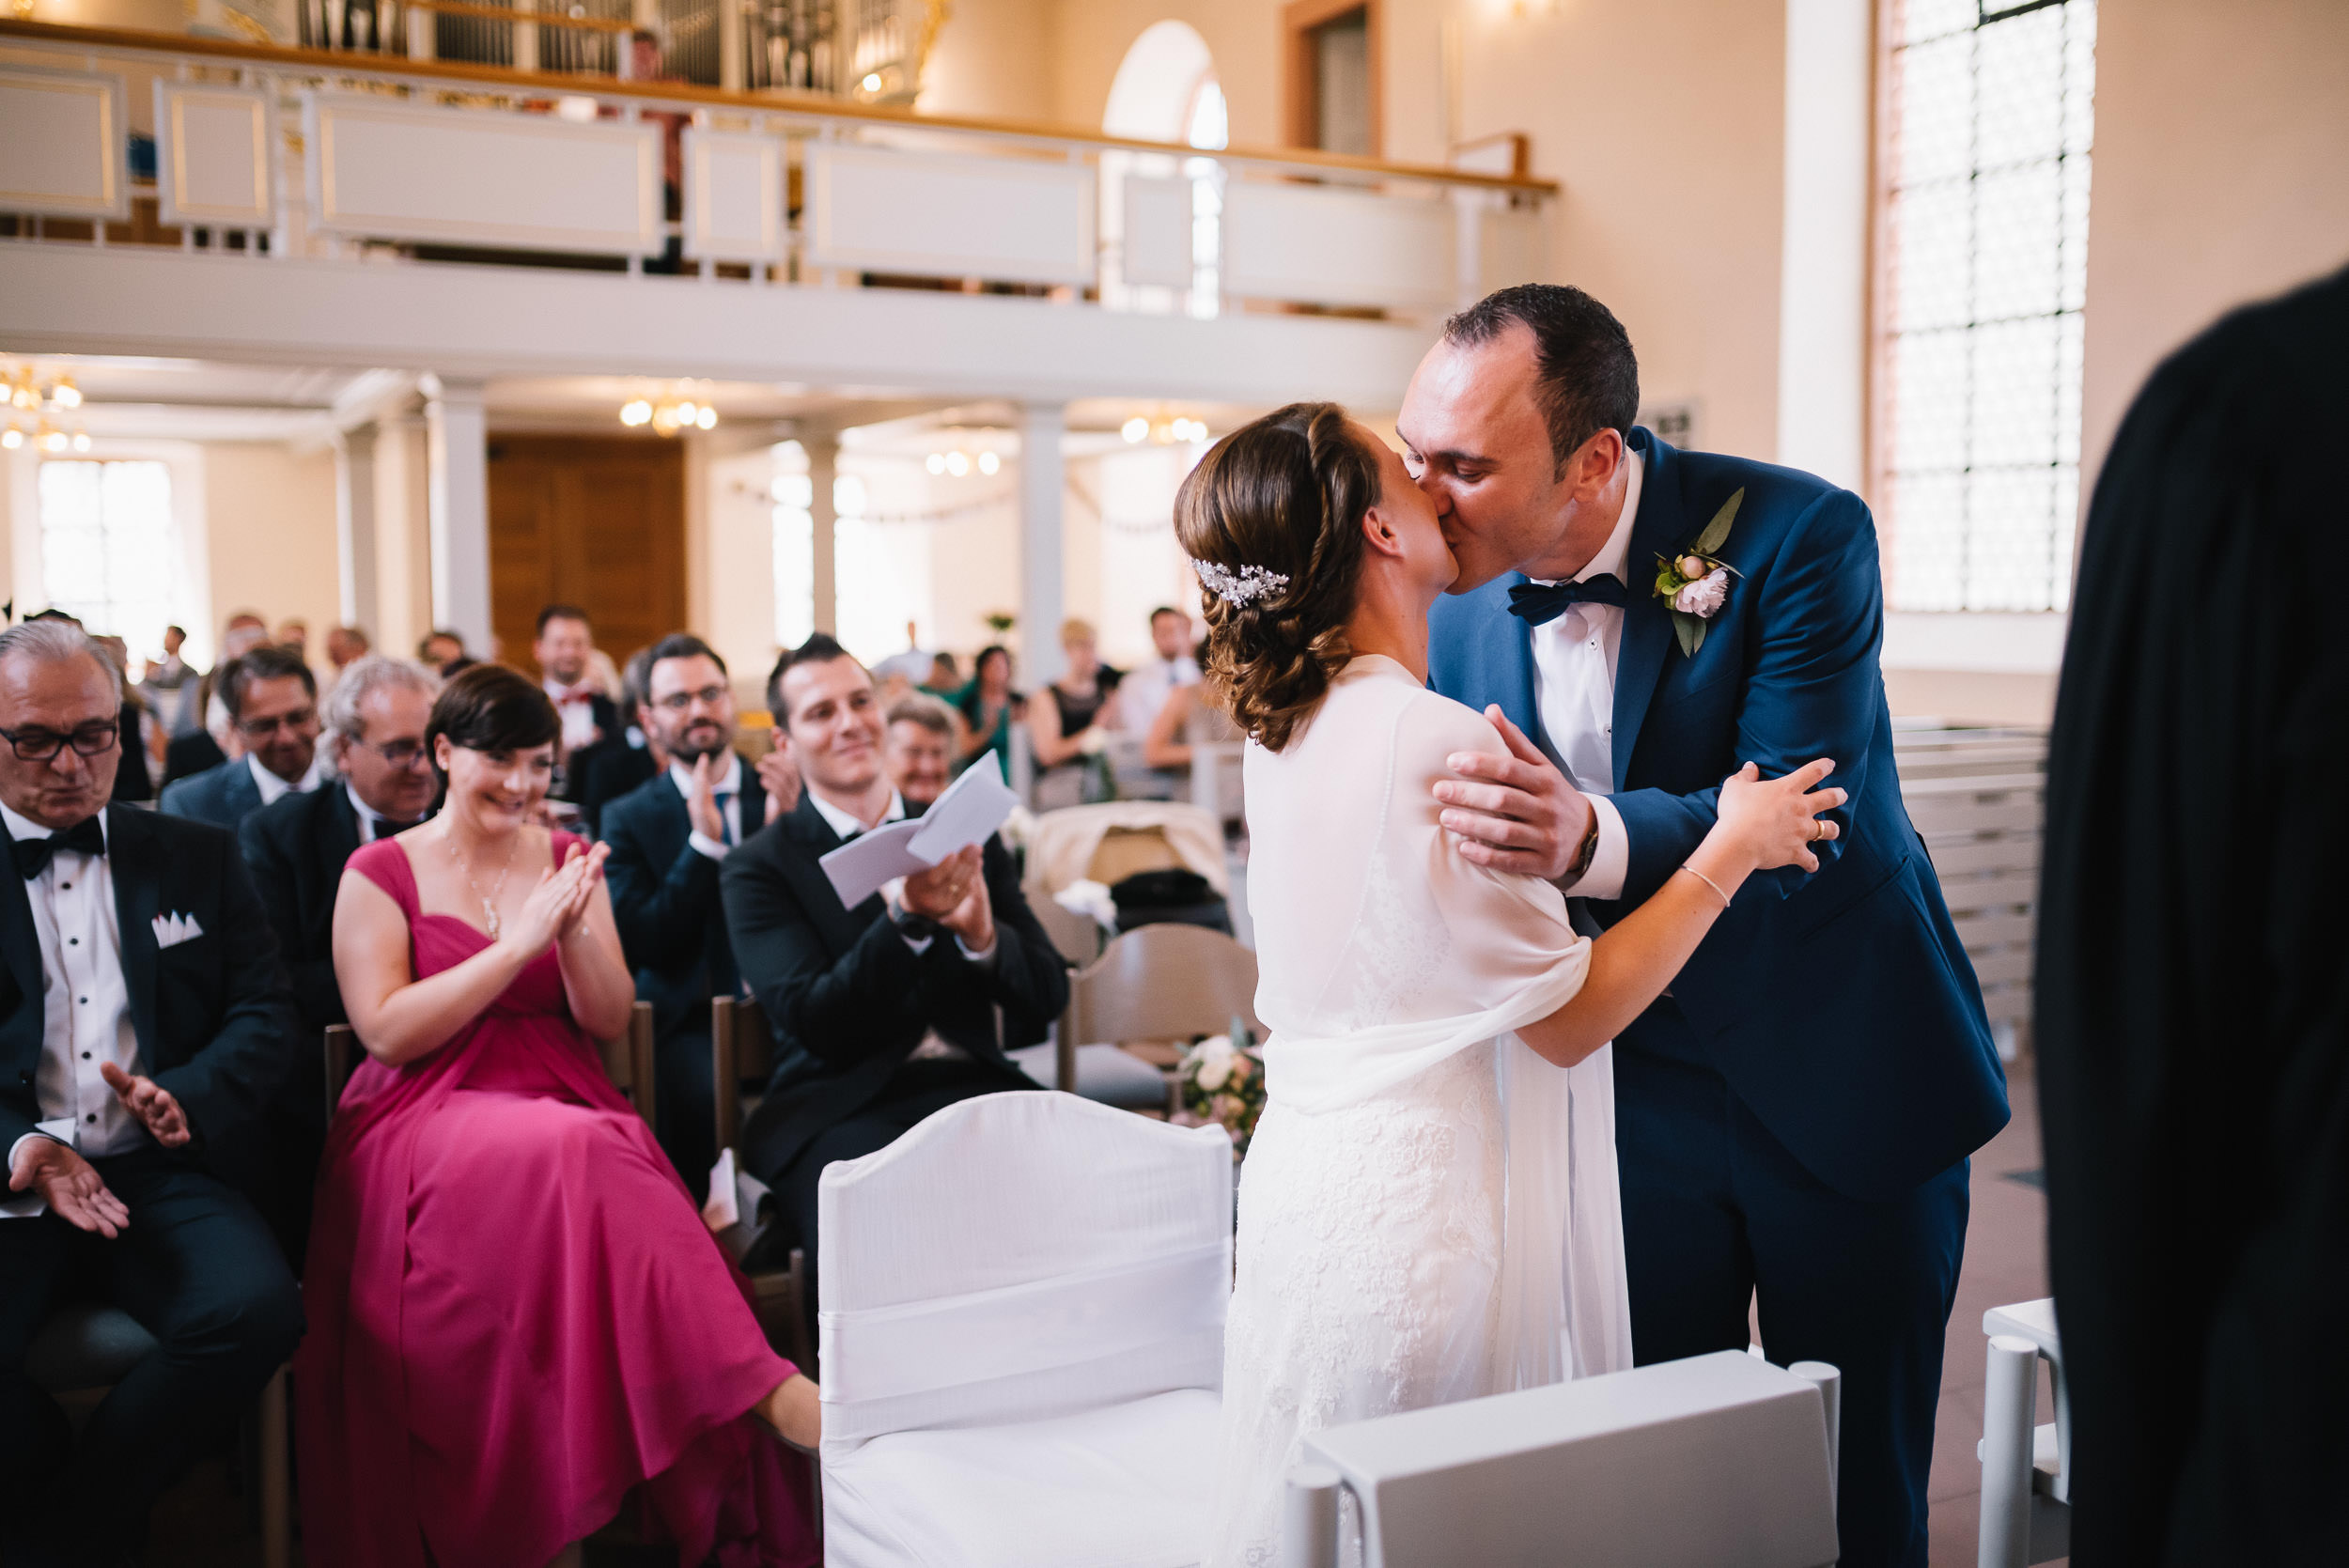 Hochzeit-Julia+Lars-Leimen+Bonsaizentrum-HD-031.jpg